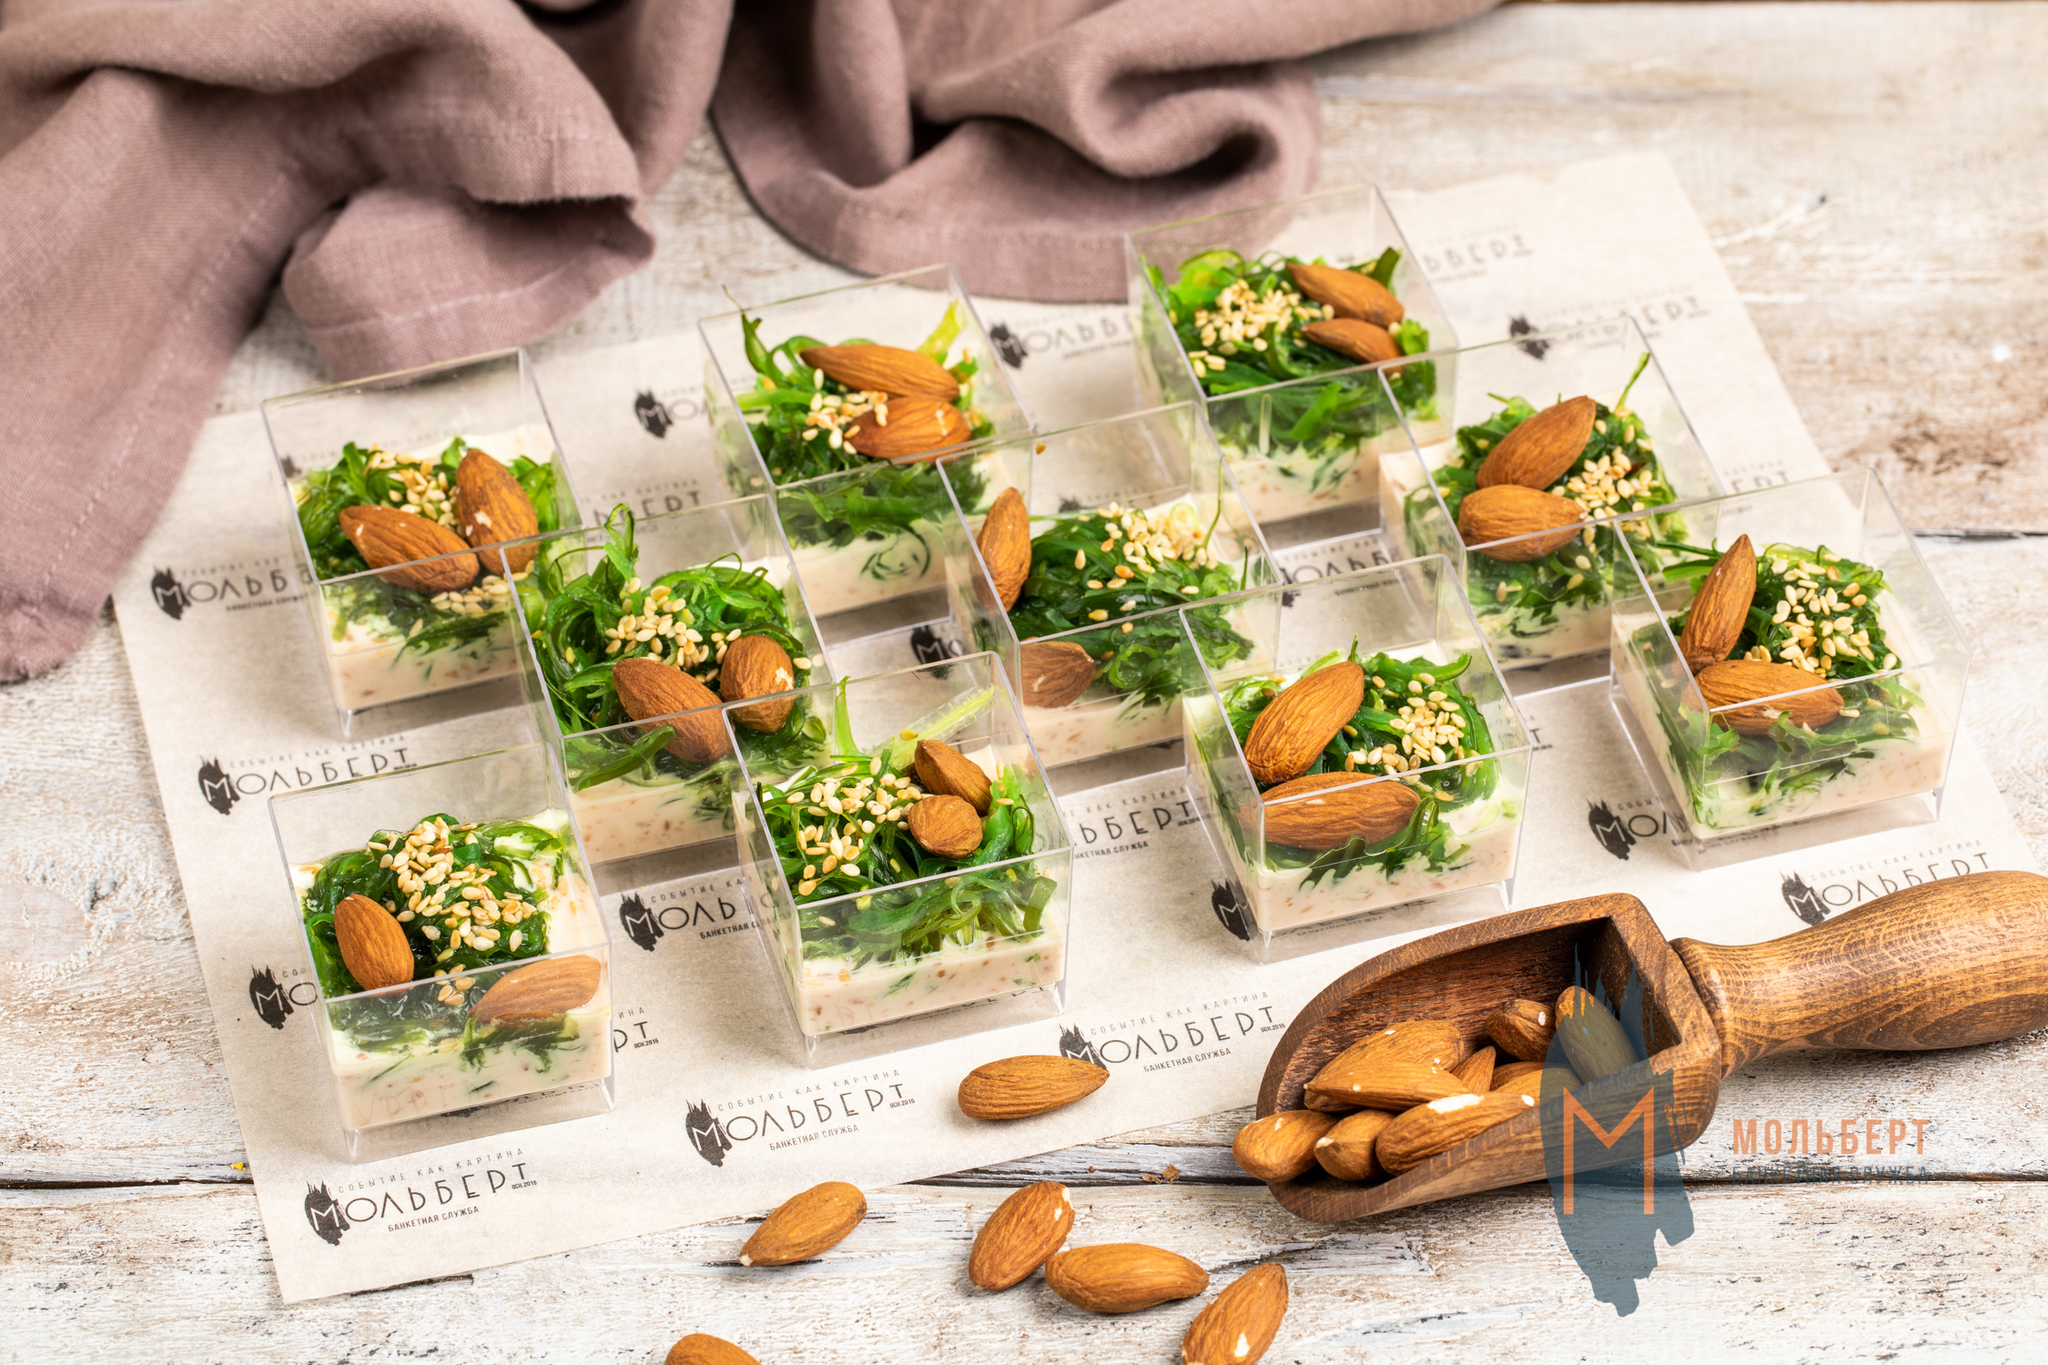 Веррин с салатом чука, миндалем